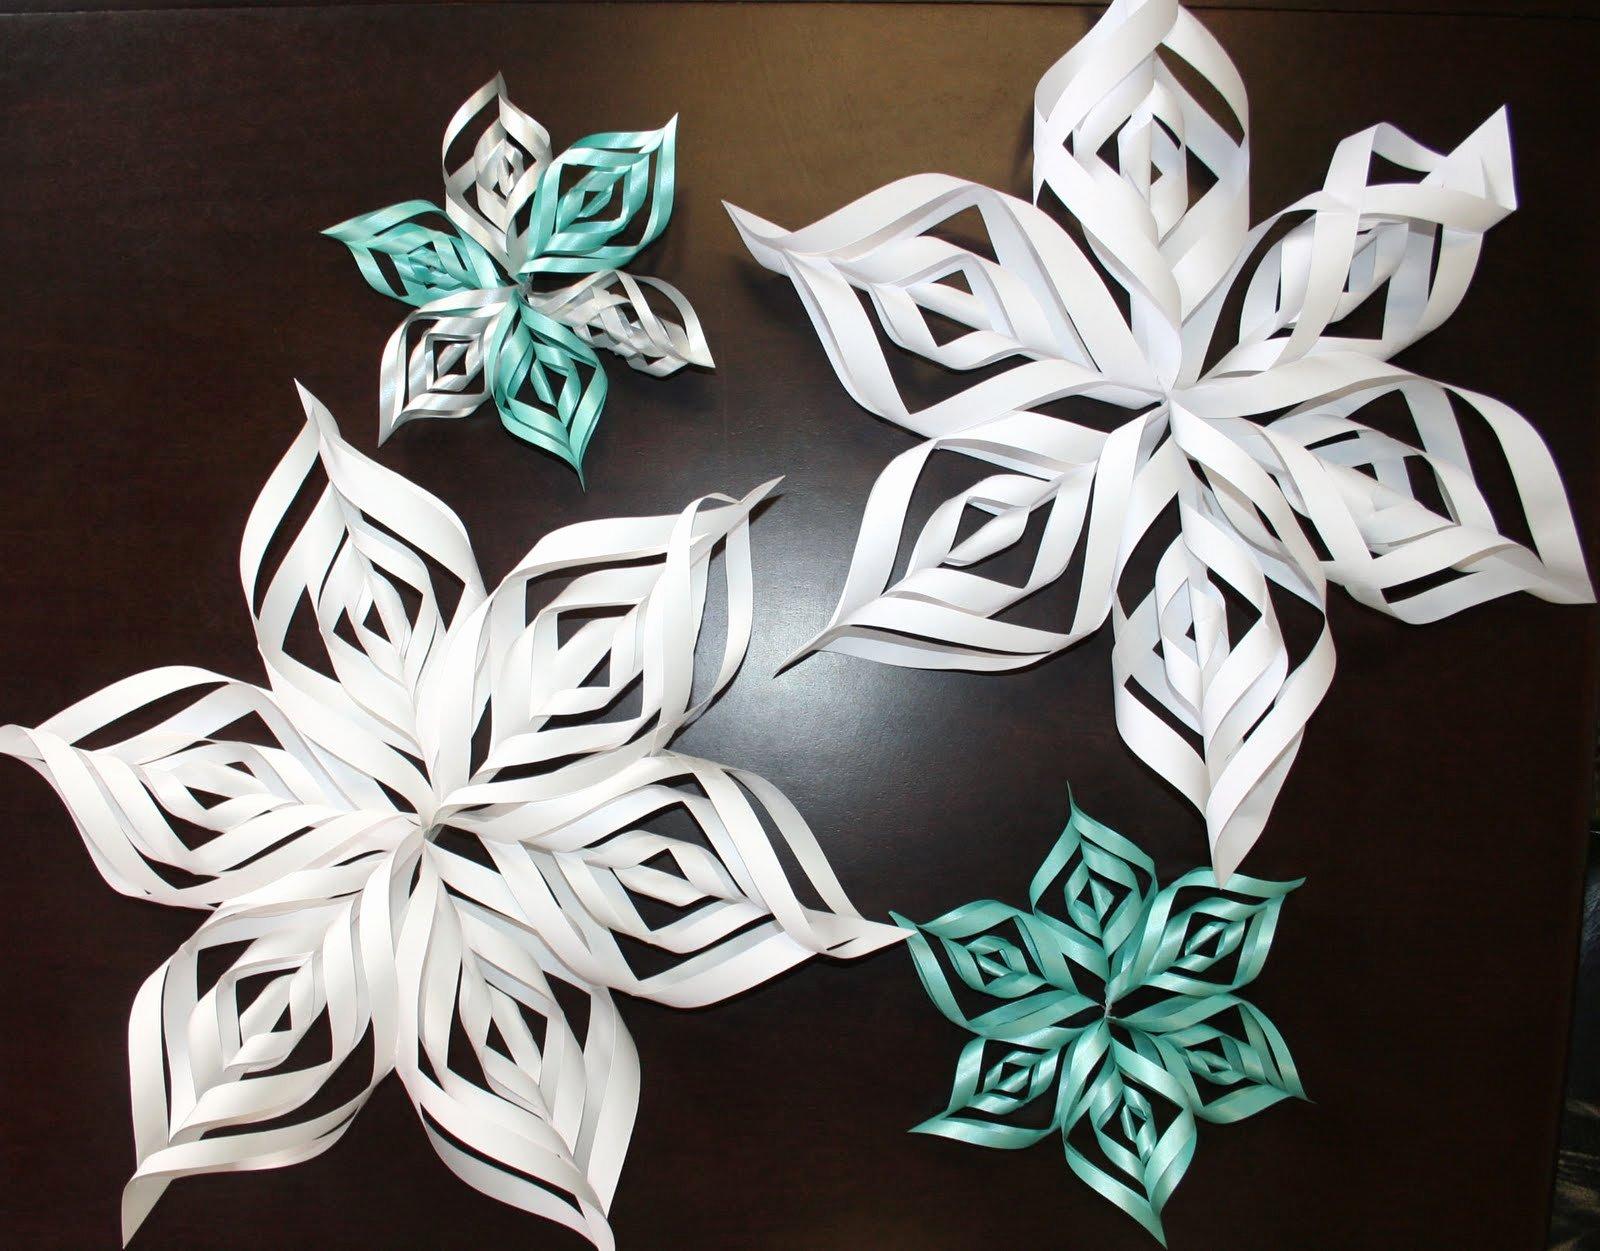 3 D Paper Snowflakes Beautiful Paper Zone Inspiresigneate 3d Snowflake Pattern